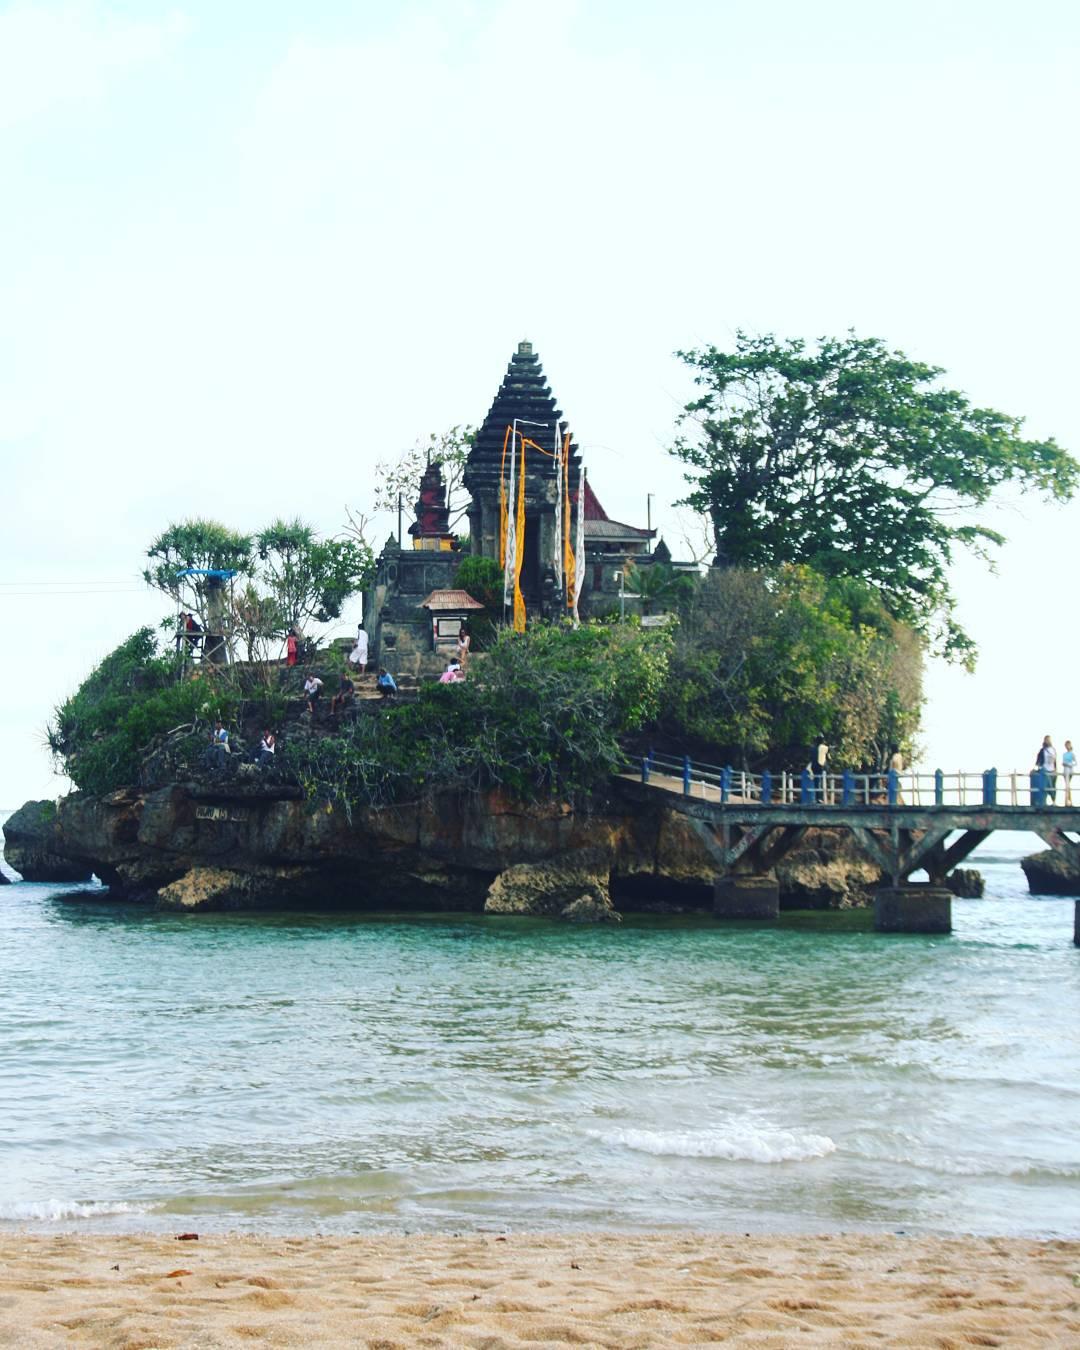 Pantai Di Pasuruan : pantai, pasuruan, Pantai, Balekambang,, Indah, Paling, Populer, Malang, Update, Pengetahuanmu